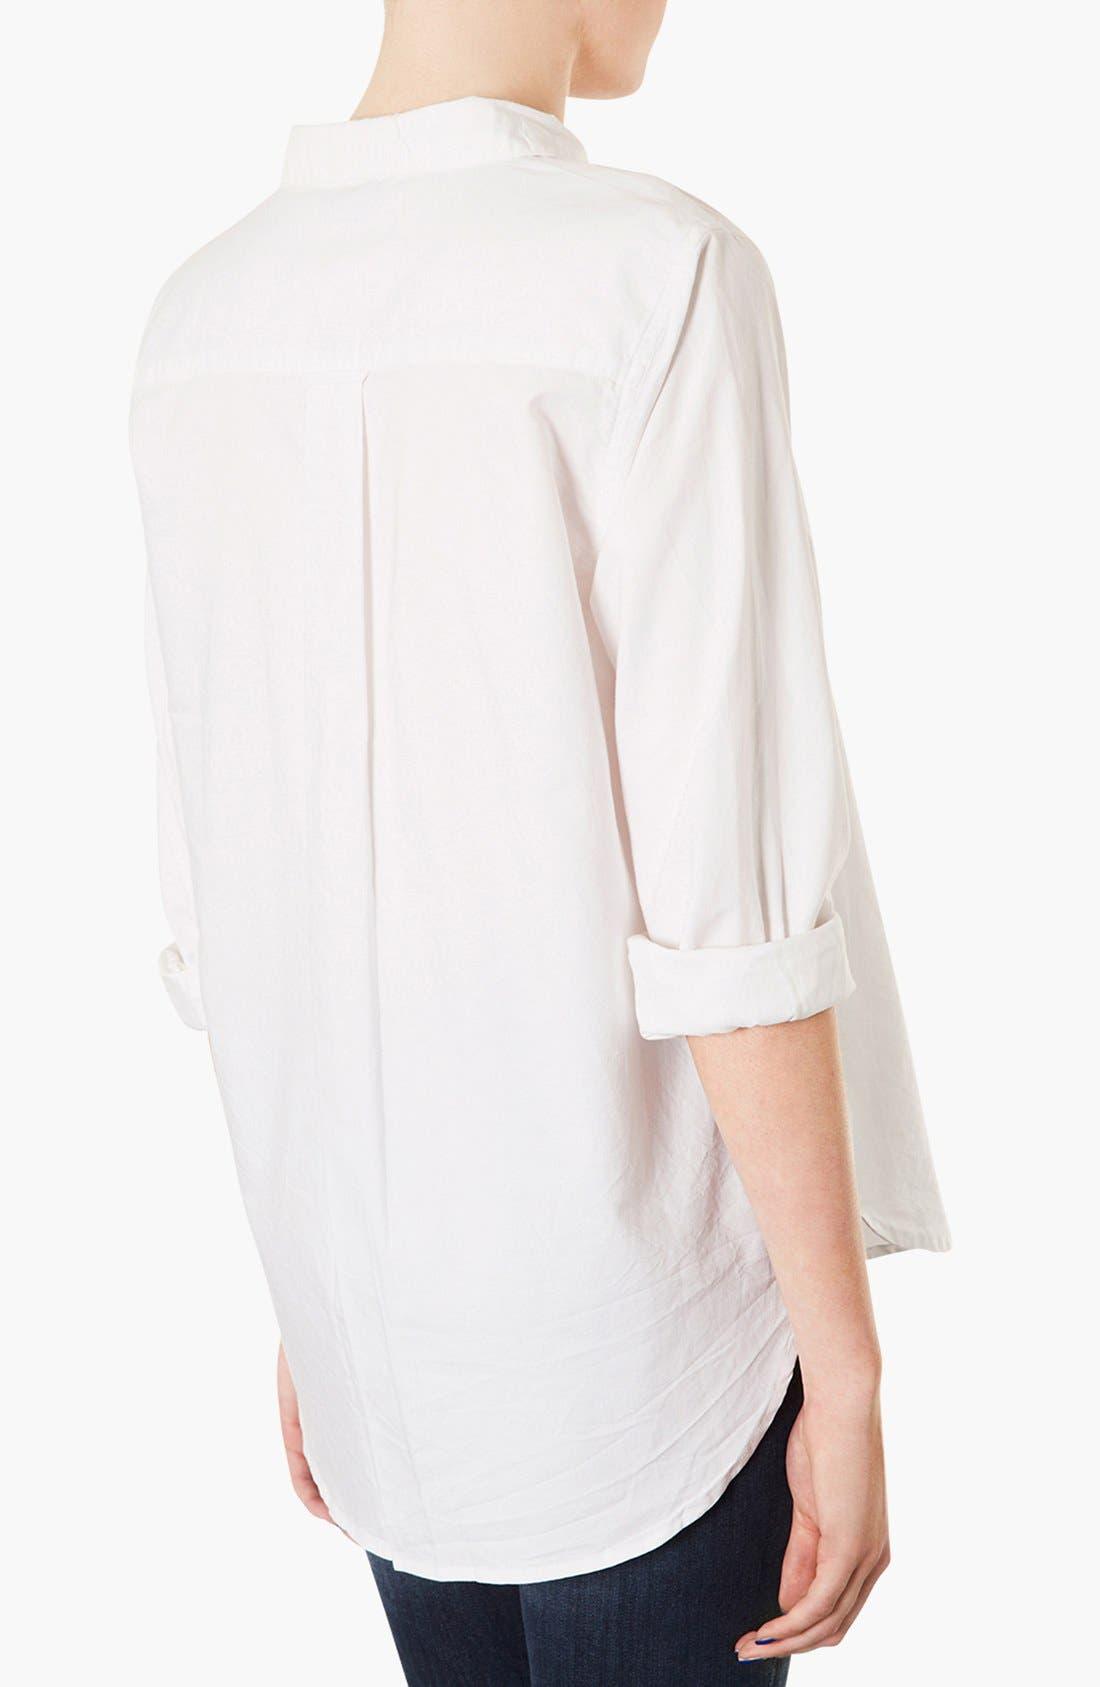 TOPSHOP, Woven Oxford Shirt, Alternate thumbnail 2, color, 100